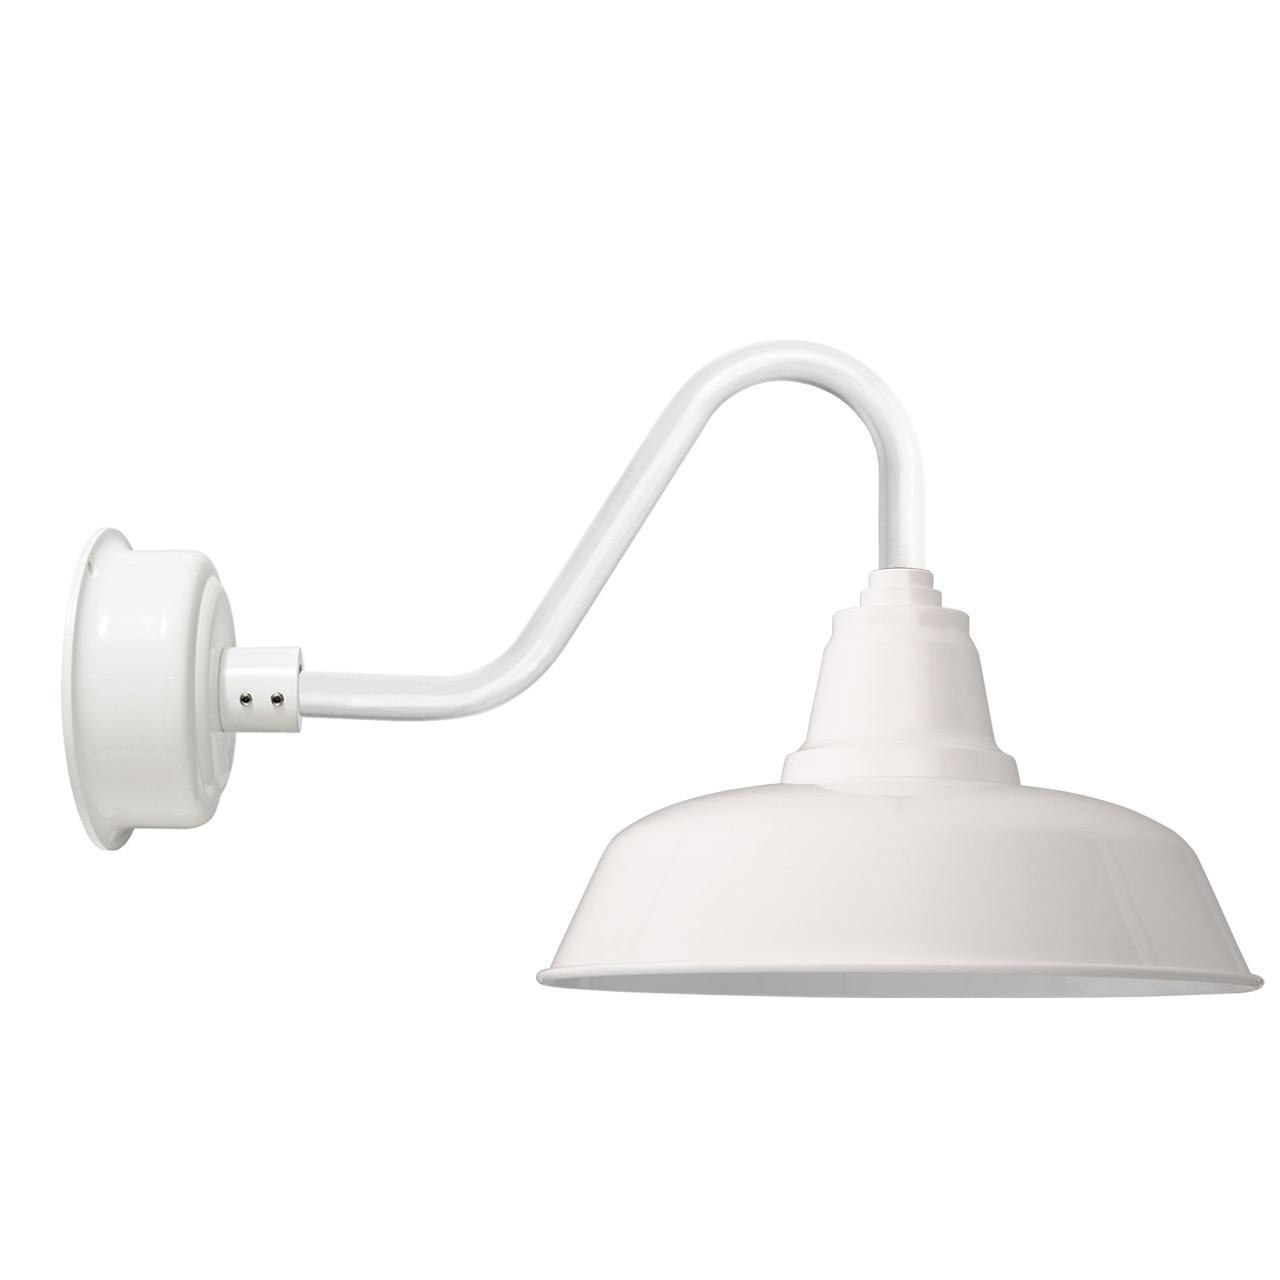 "Goodyear 1 Light Outdoor Barn Light: Vintage 14"" White Goodyear Indoor/Outdoor LED Barn Lights"